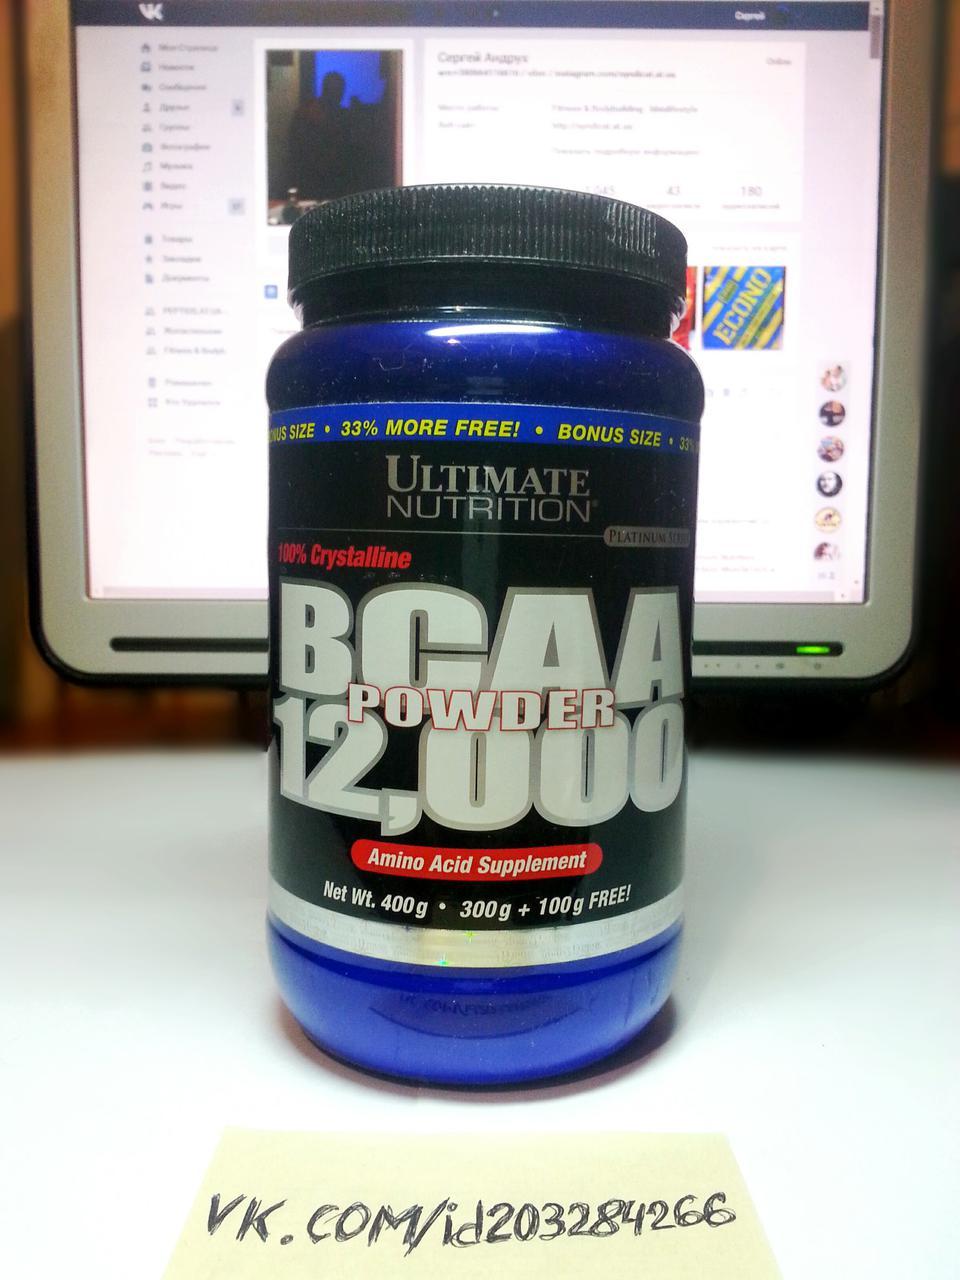 Ultimate Nutrition BCAA Powder 12,000 Crystalline 400г 67 порций